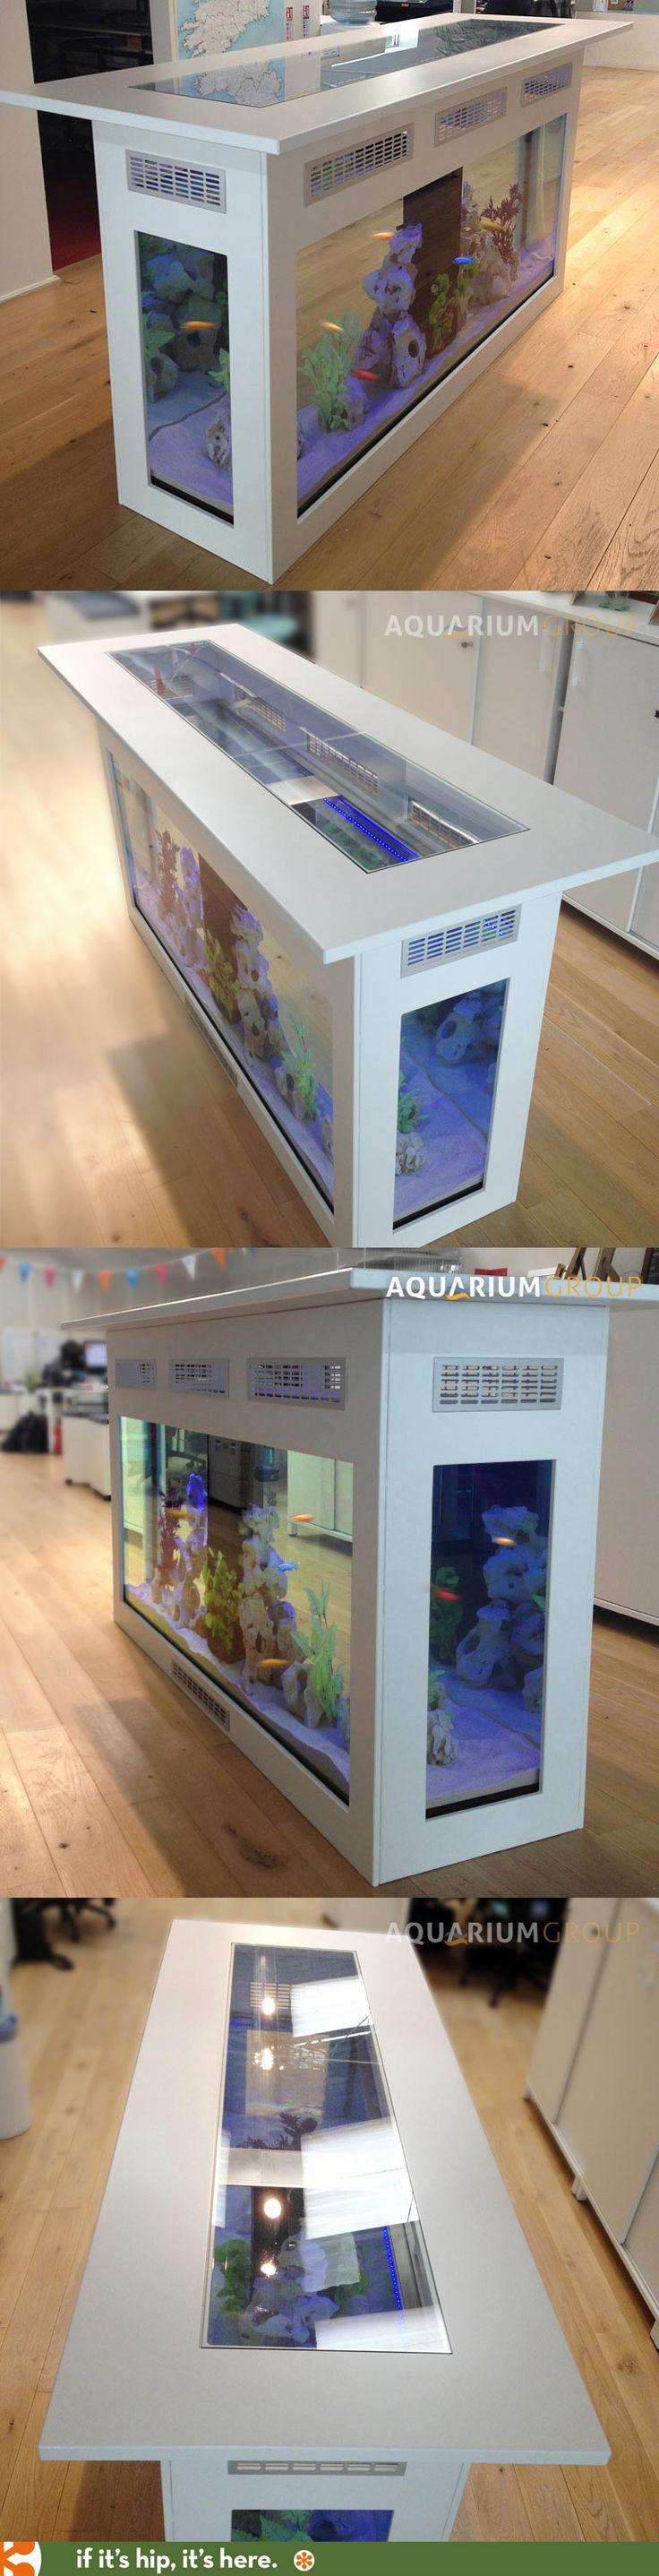 Aquarium Interior Design Ideas https://www.youtube.com/playlist?list=PLl8qTg6_ZvjEyKwVMIArpOdW_zT9ltCdl&action_edit=1